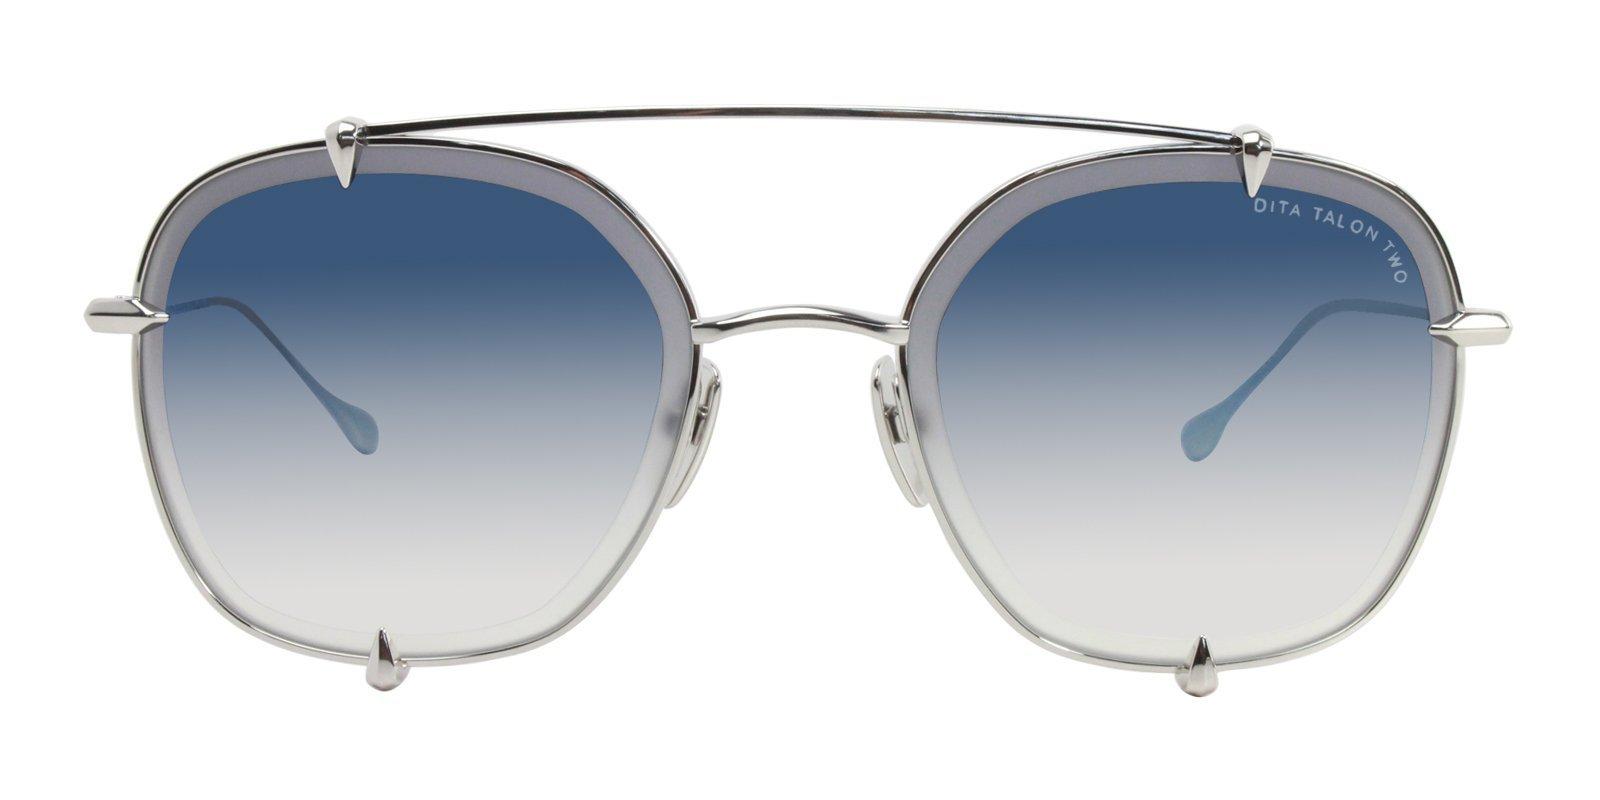 d700f61c16e dita-sunglasses-dita-talon-two-silver-blue-designer-eyes-814981024074